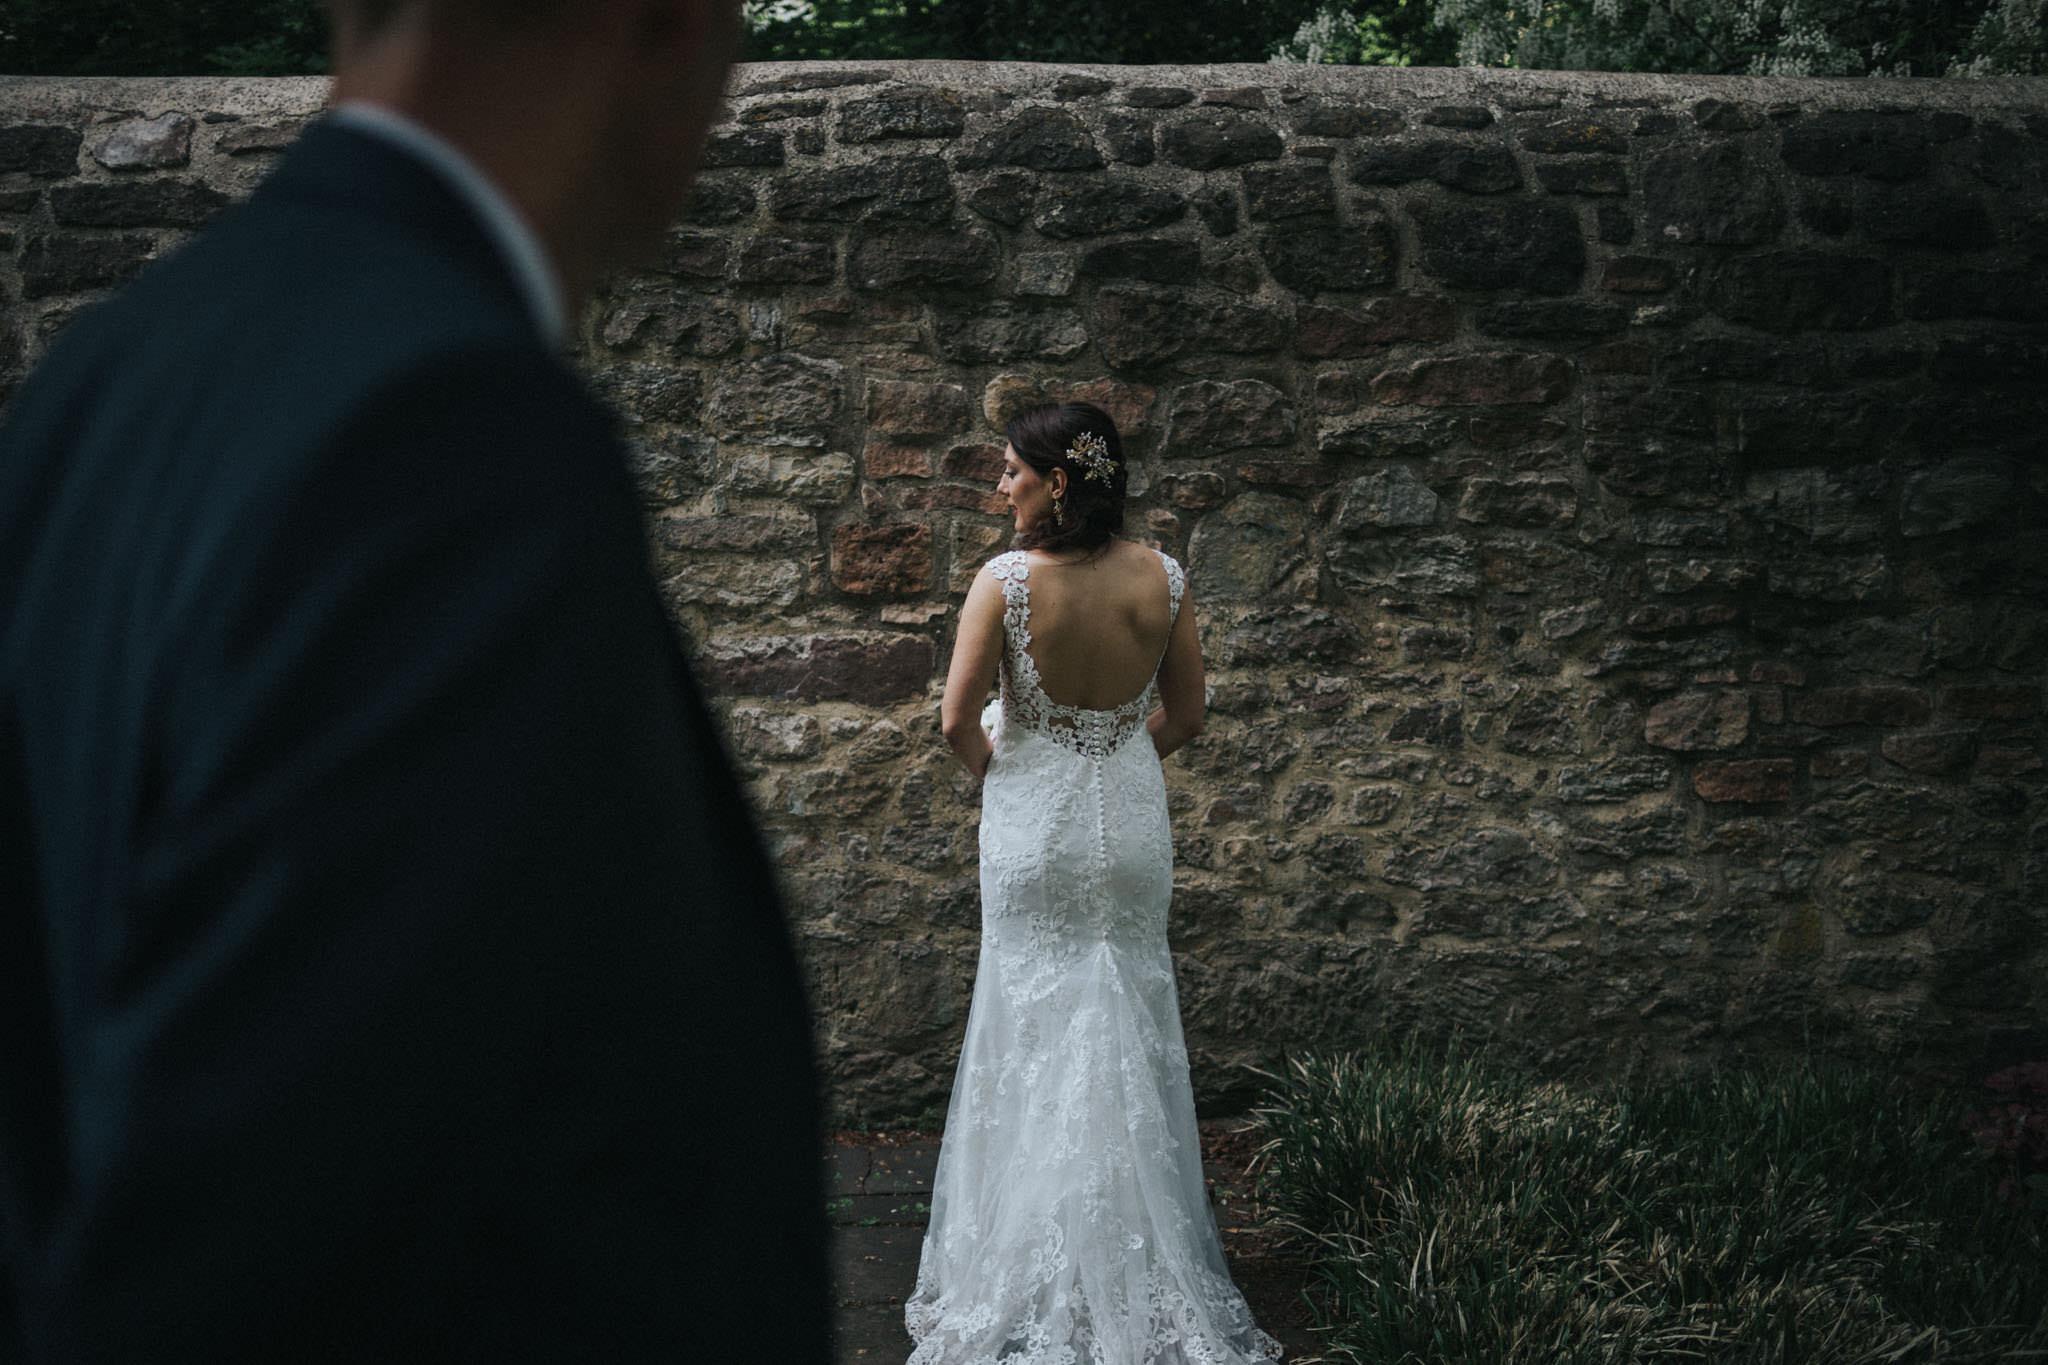 Freier Rücken der Braut